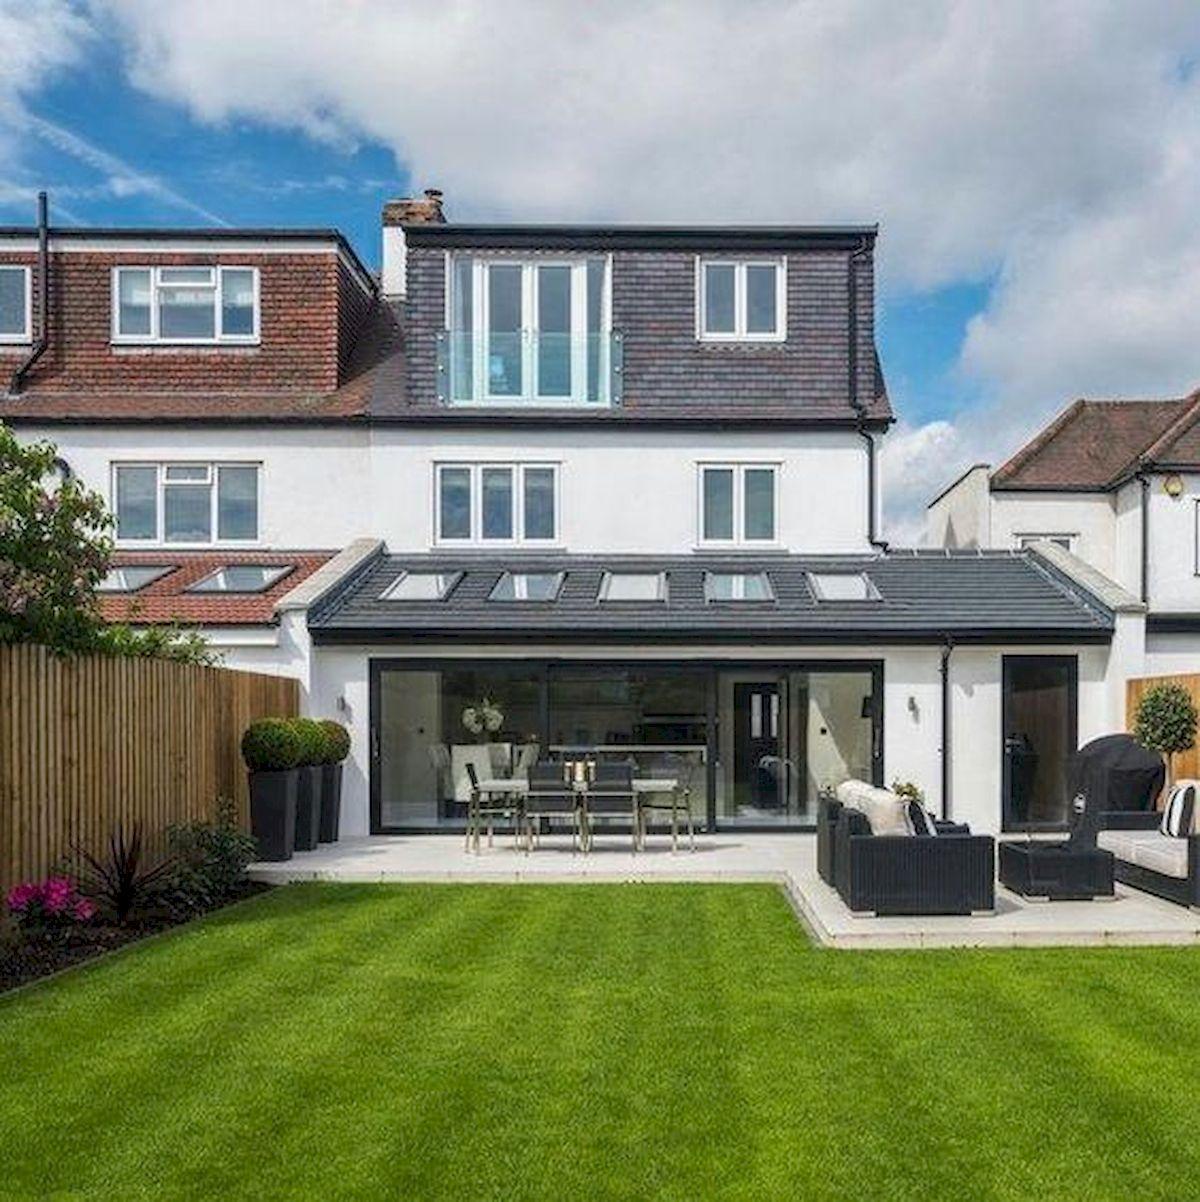 40 Fabulous Modern Garden Designs Ideas For Front Yard and Backyard Garden